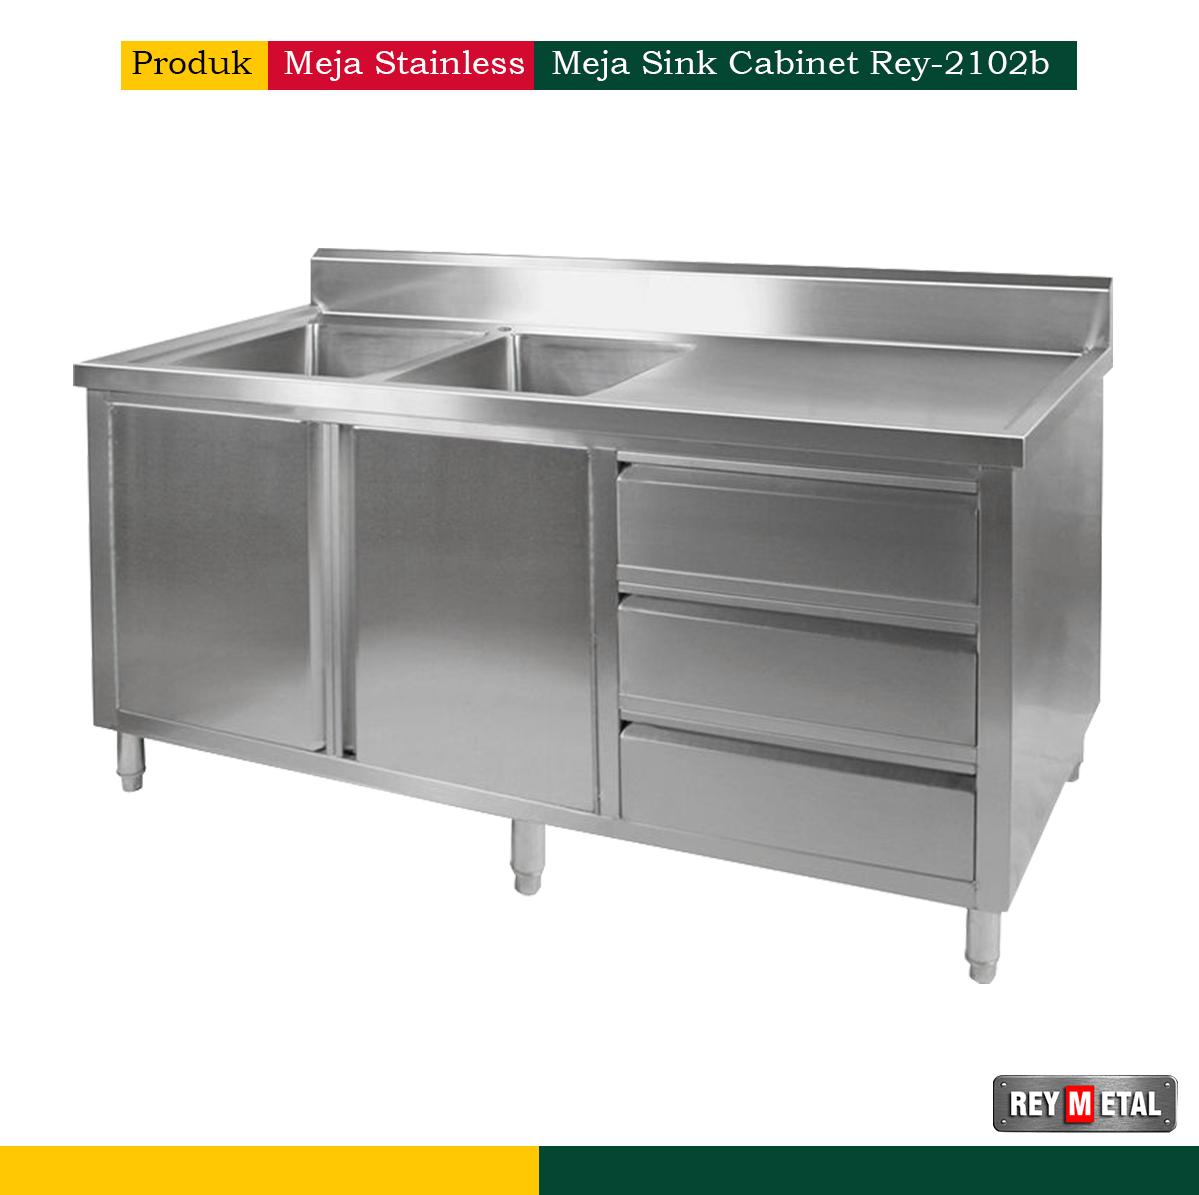 Meja Sink Cabinet Rey 2102b